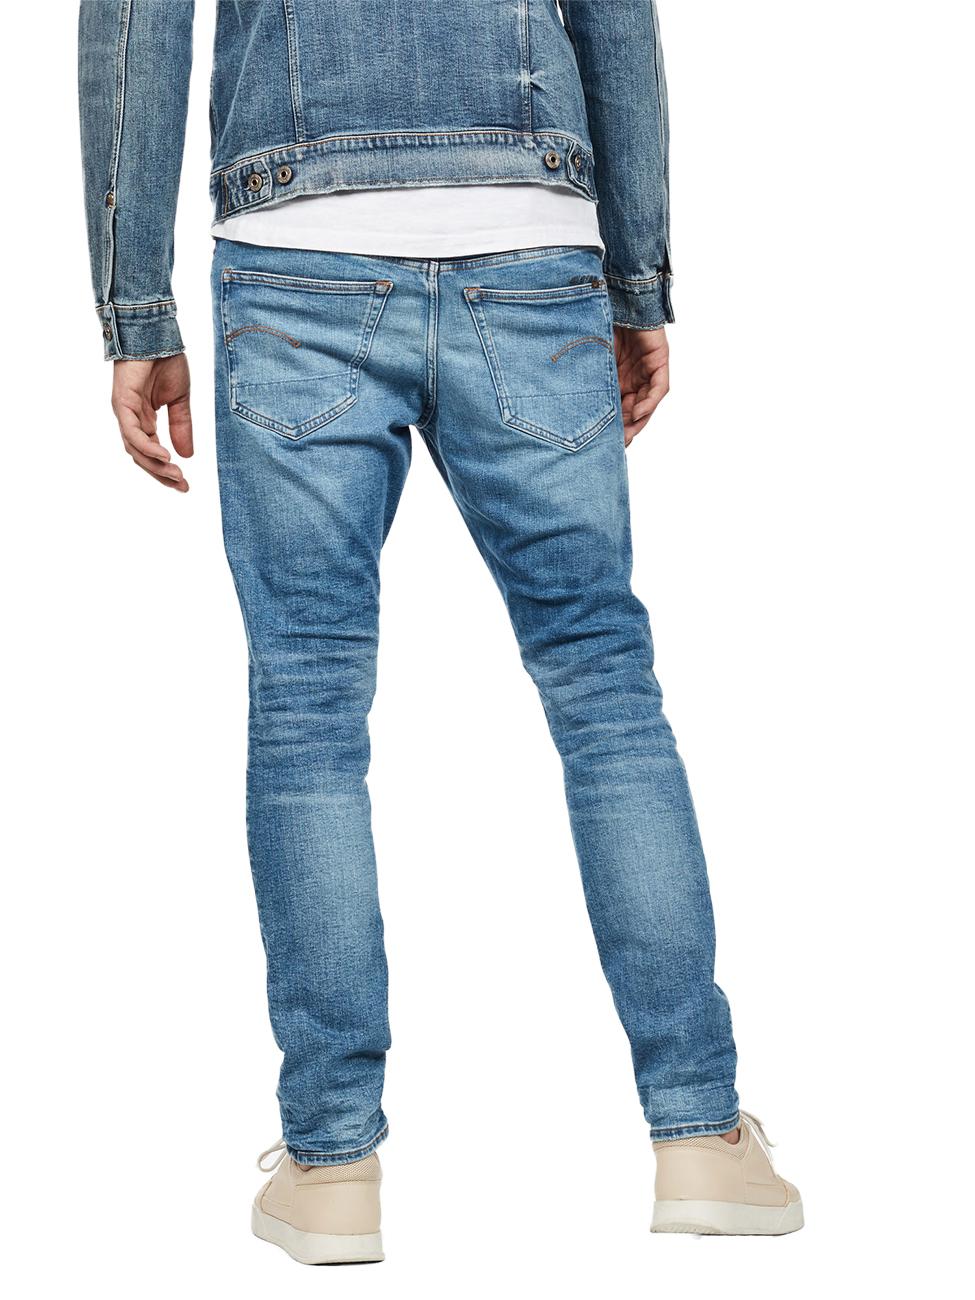 g-star-herren-jeans-3301-slim-fit-blau-authentic-faded-blue, 99.95 EUR @ jeans